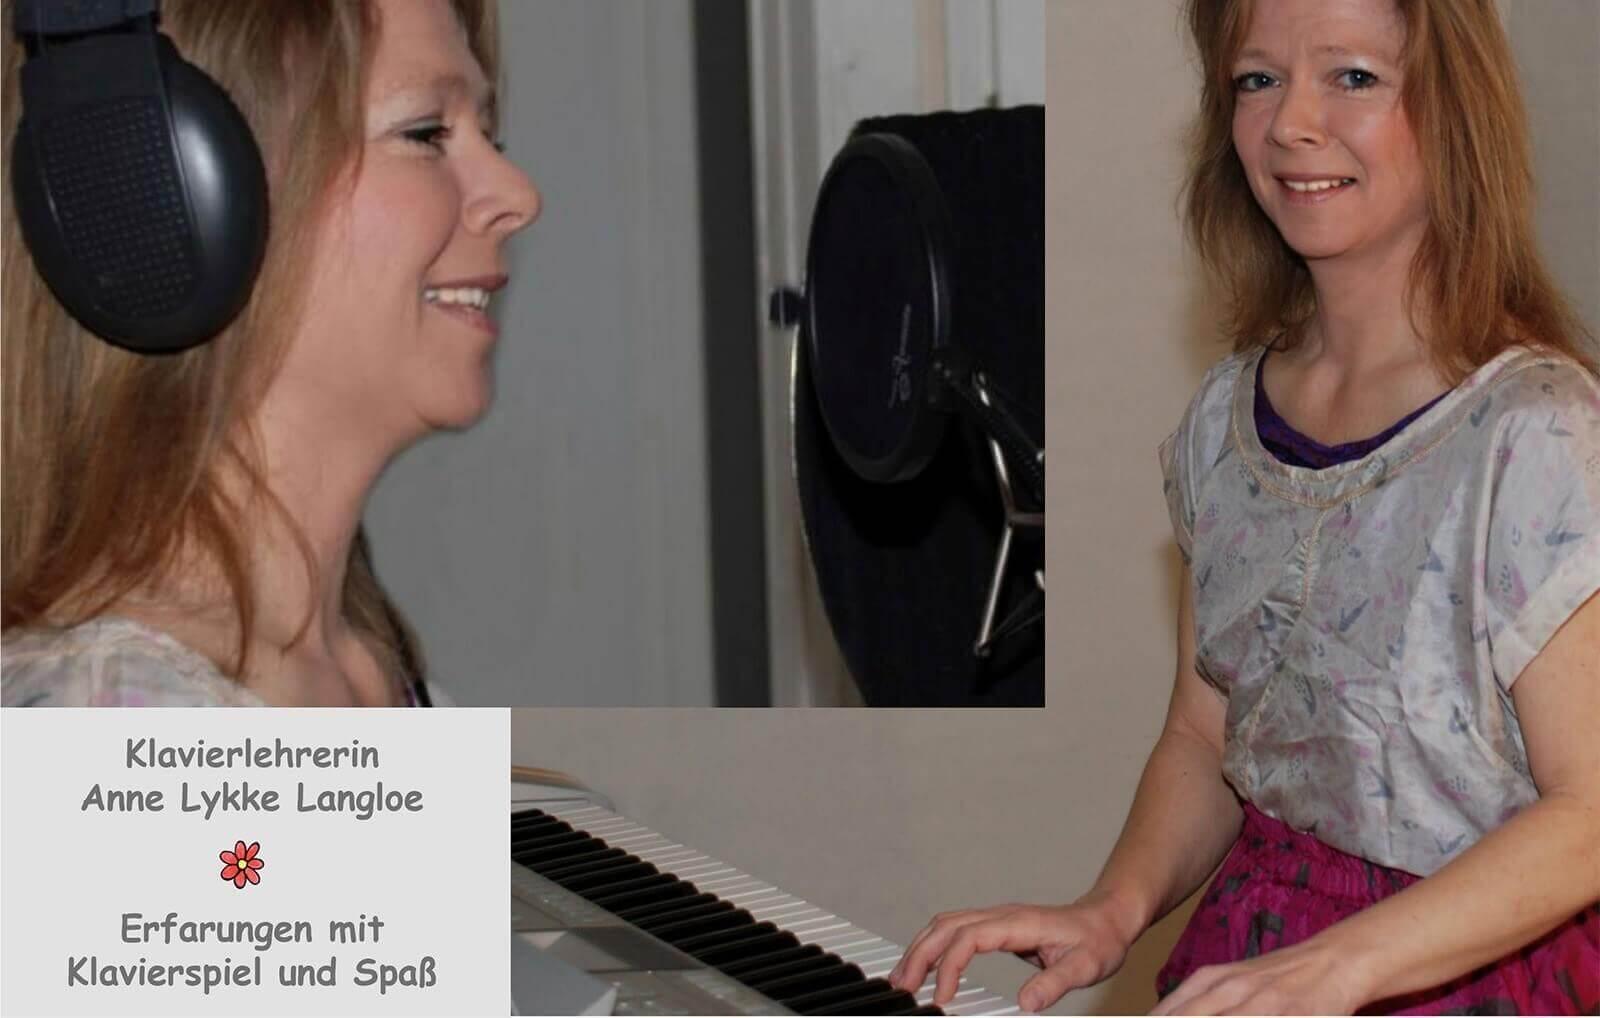 Klavierspielen lernen in den Sommerferien